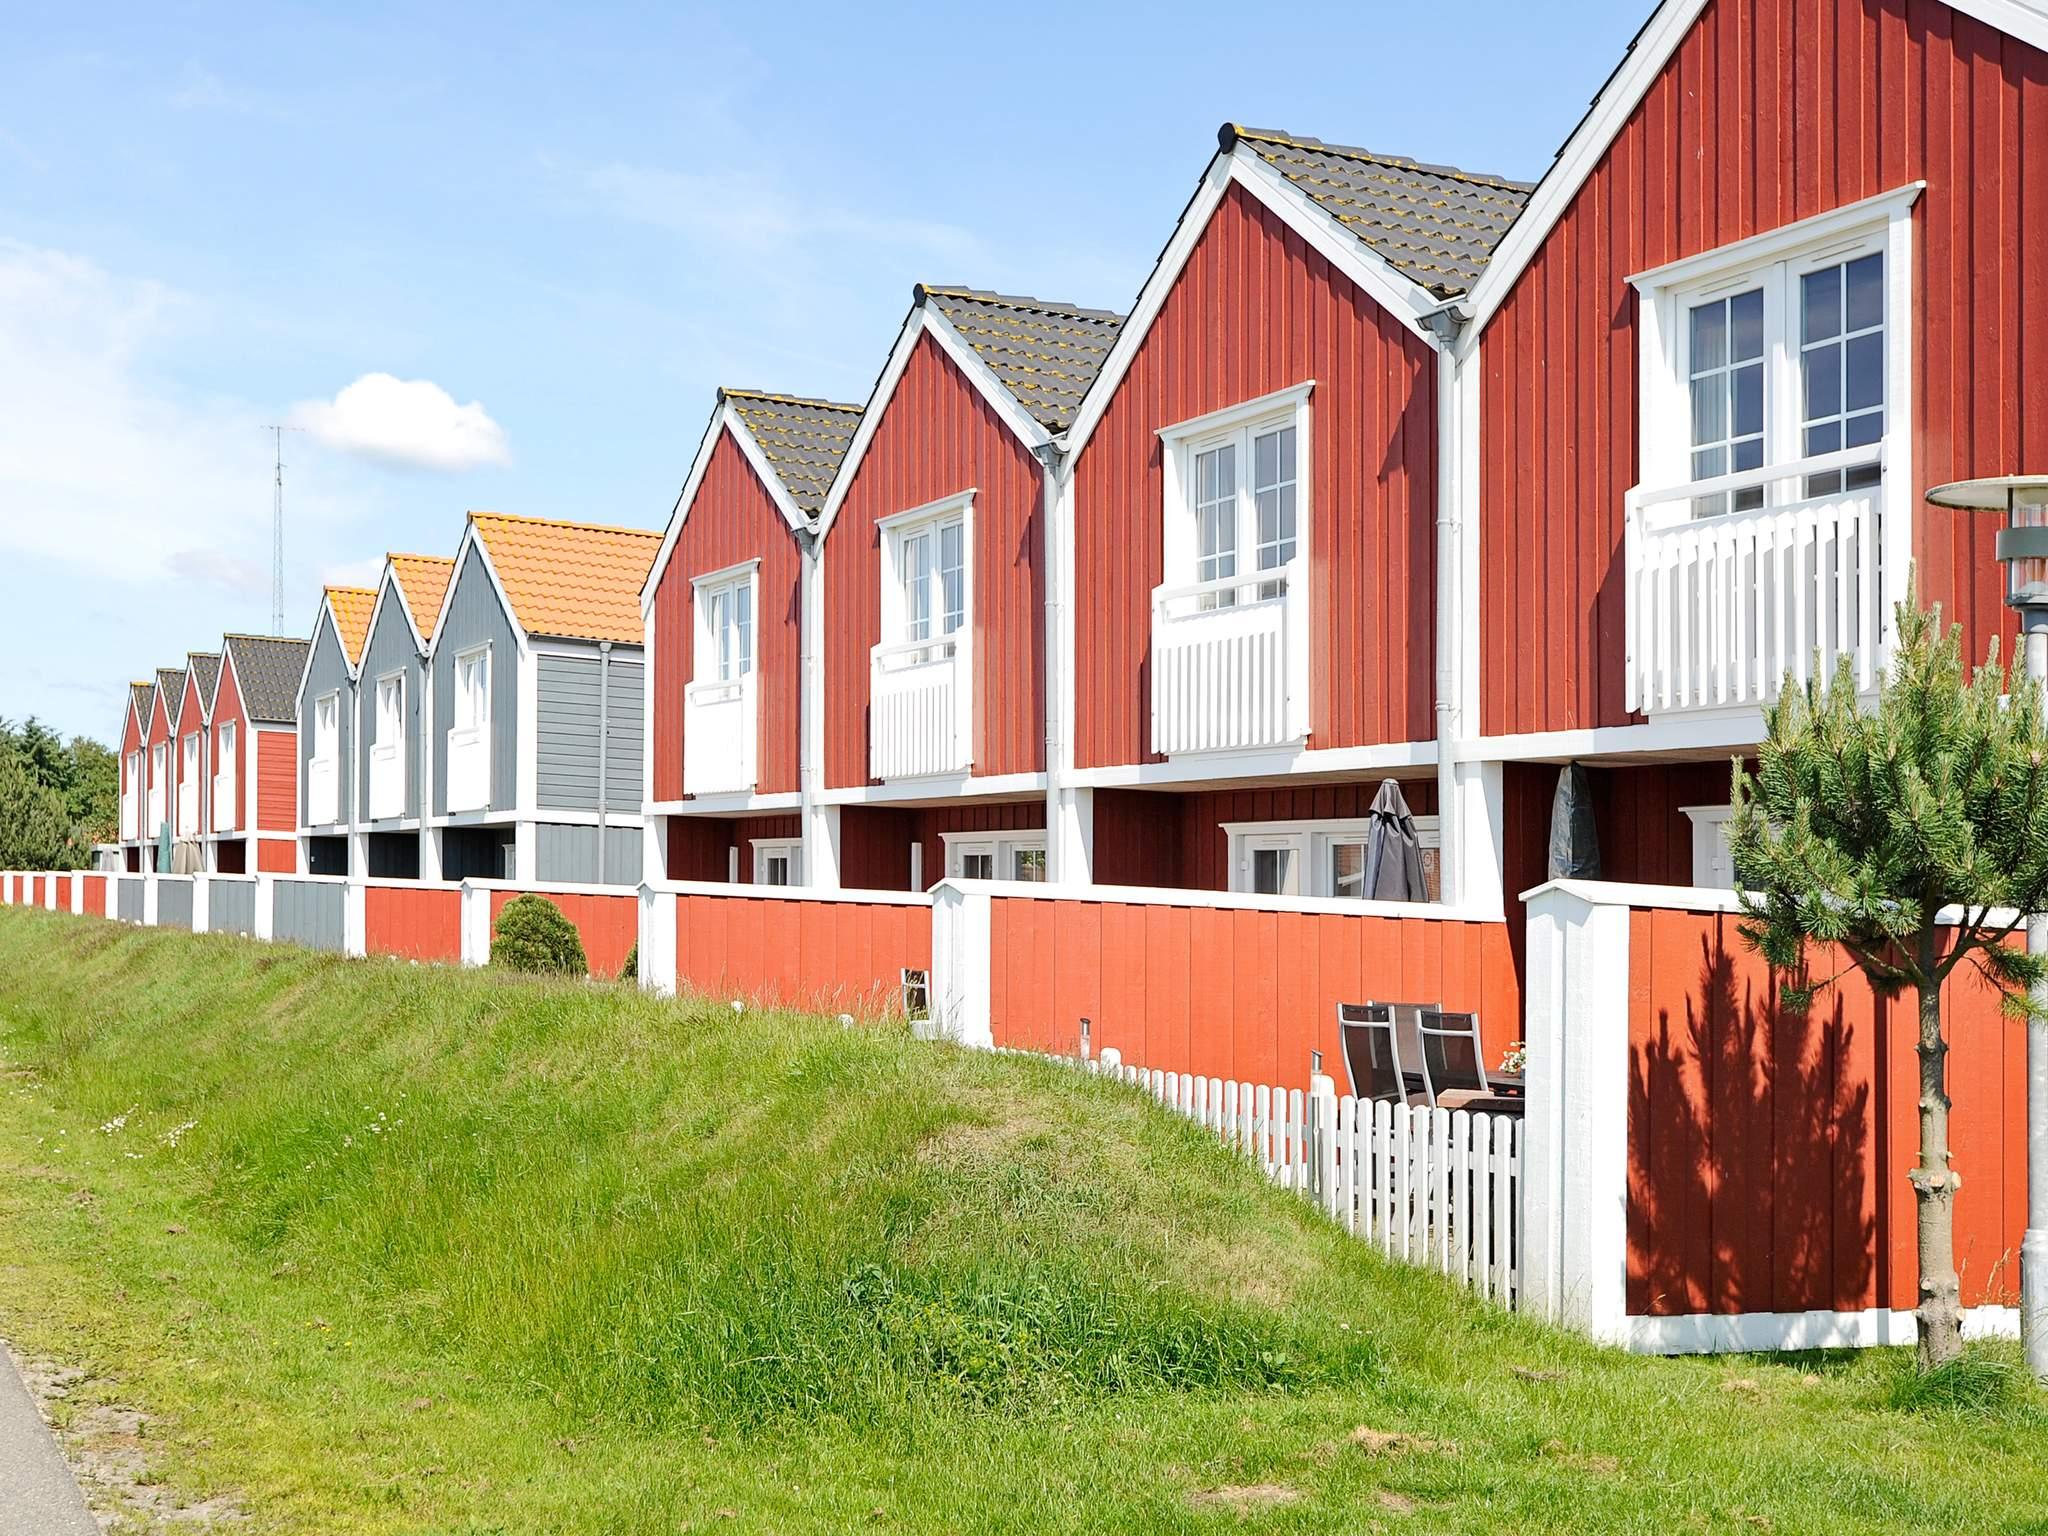 Ferienhaus Blåvand (226304), Blåvand, , Westjütland, Dänemark, Bild 18